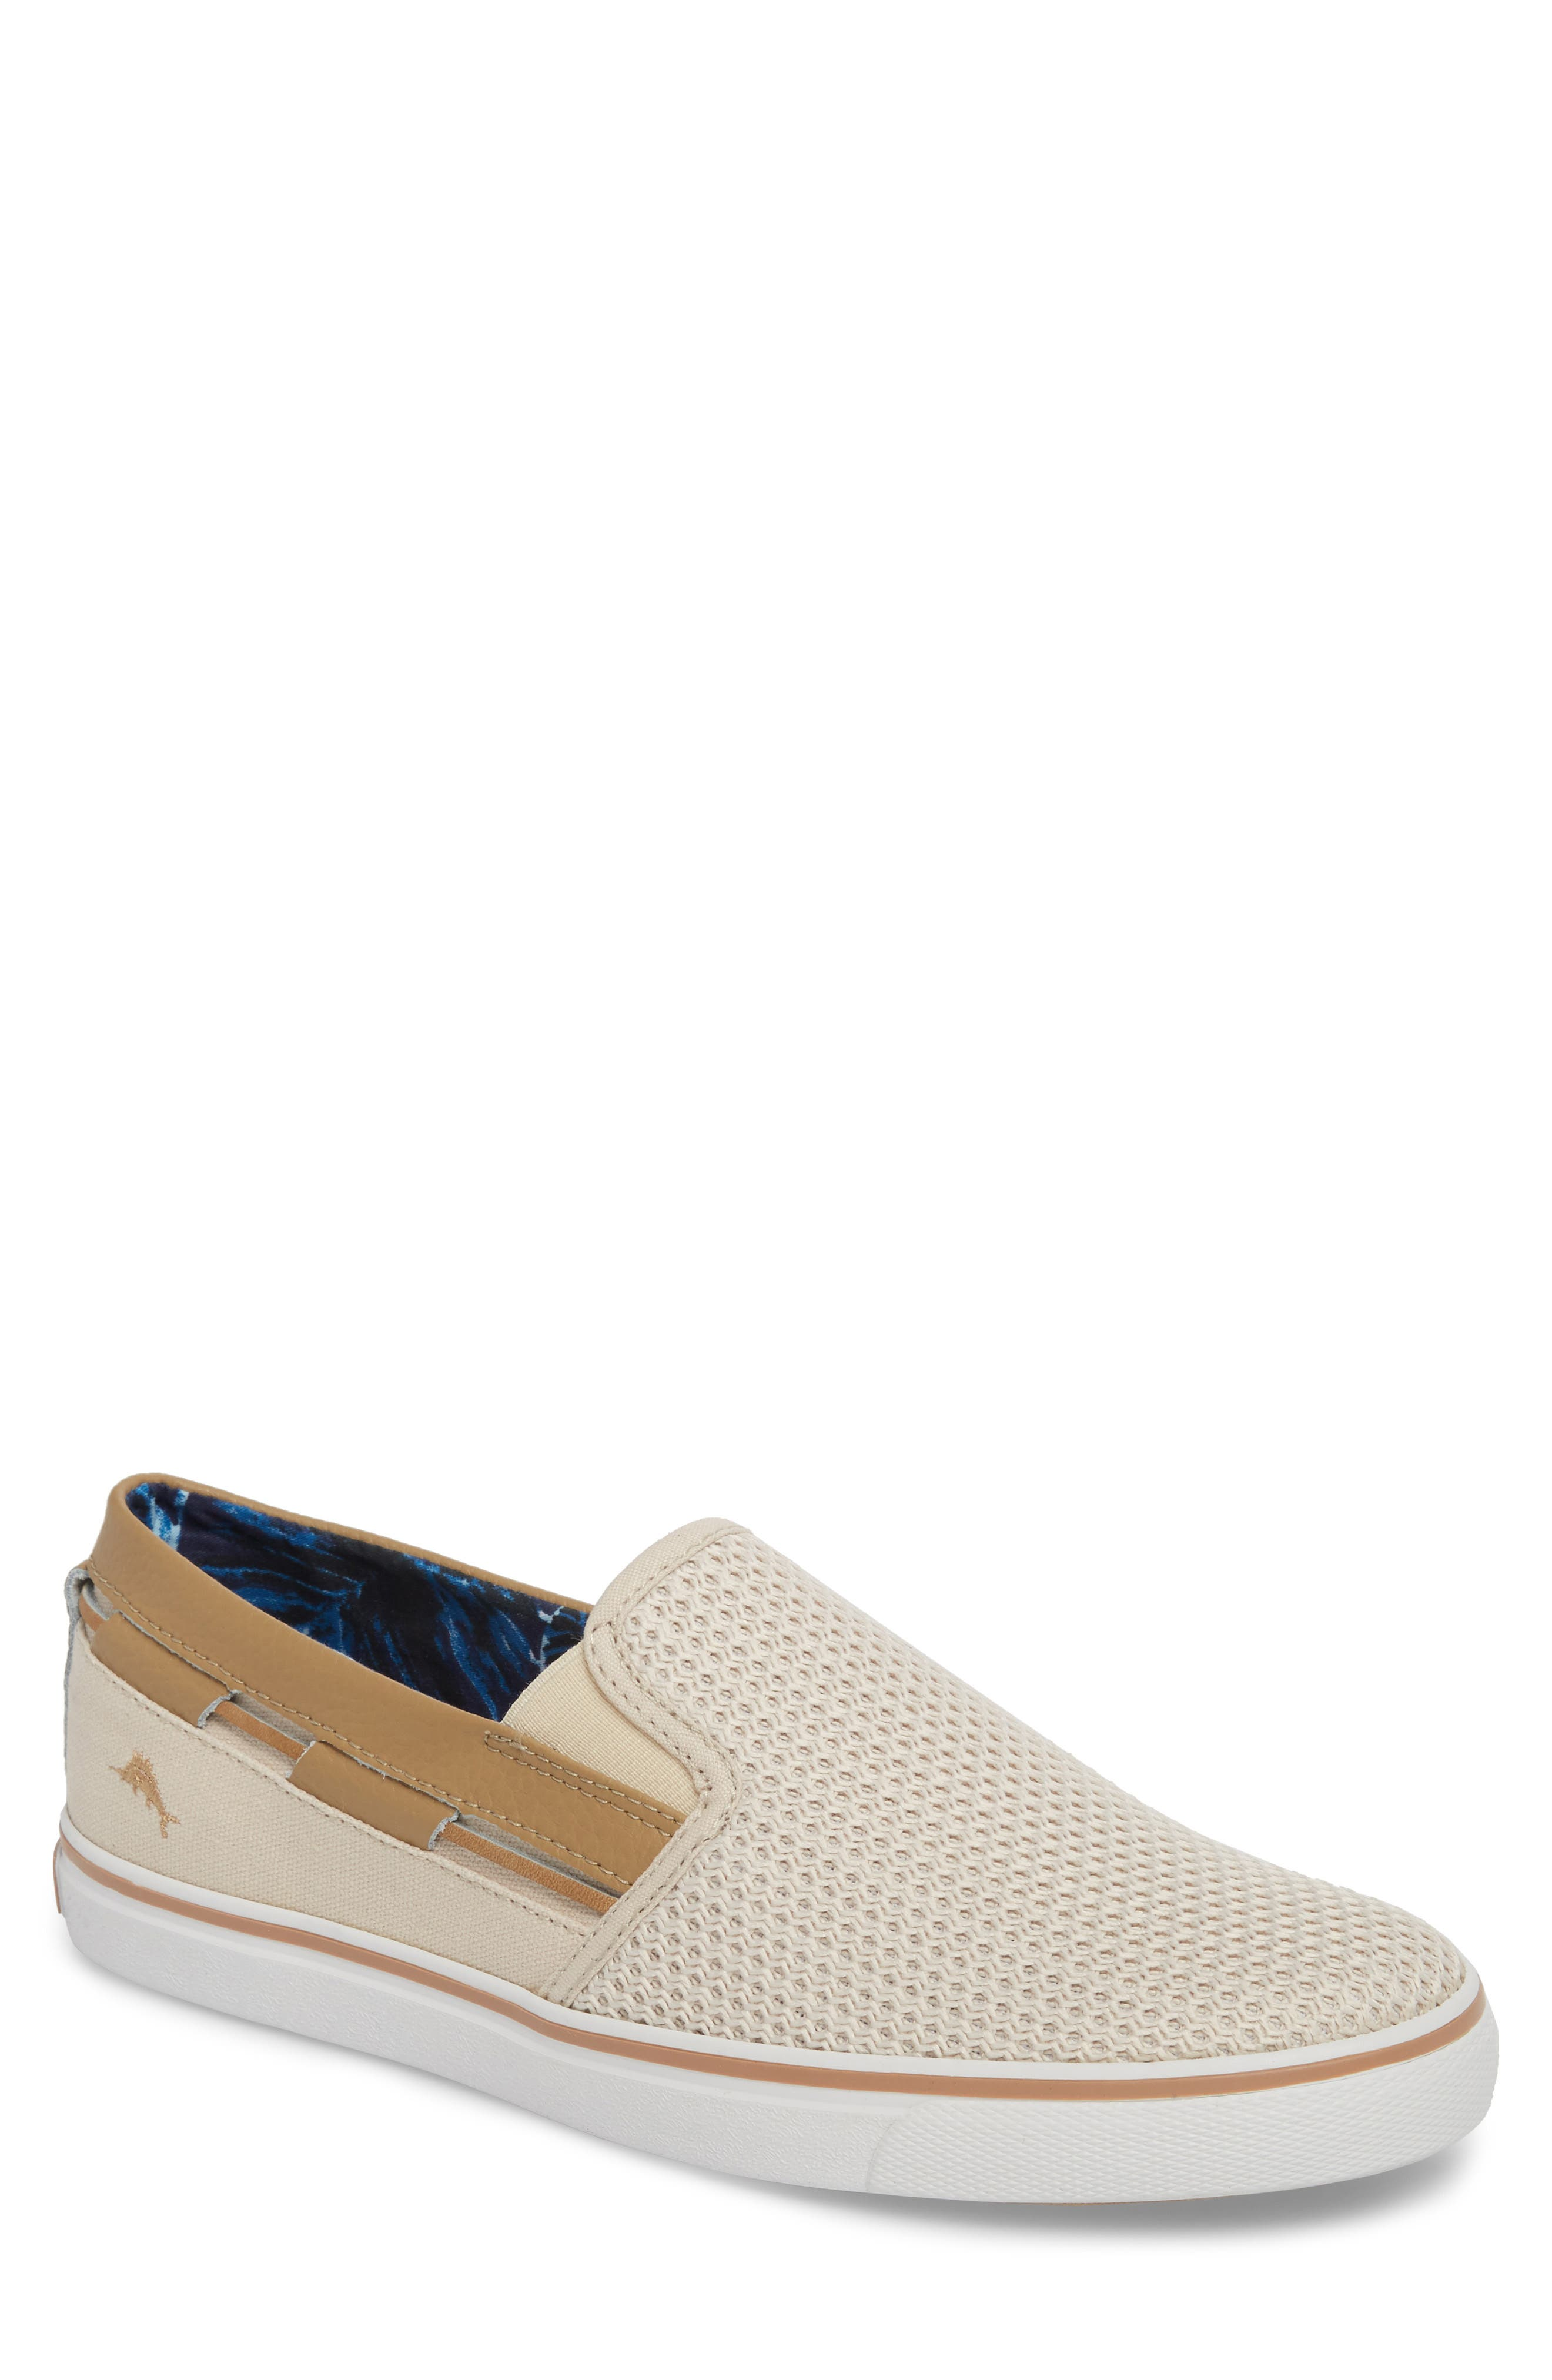 Exodus Mesh Slip-On Sneaker,                         Main,                         color, Cream Mesh/ Textile